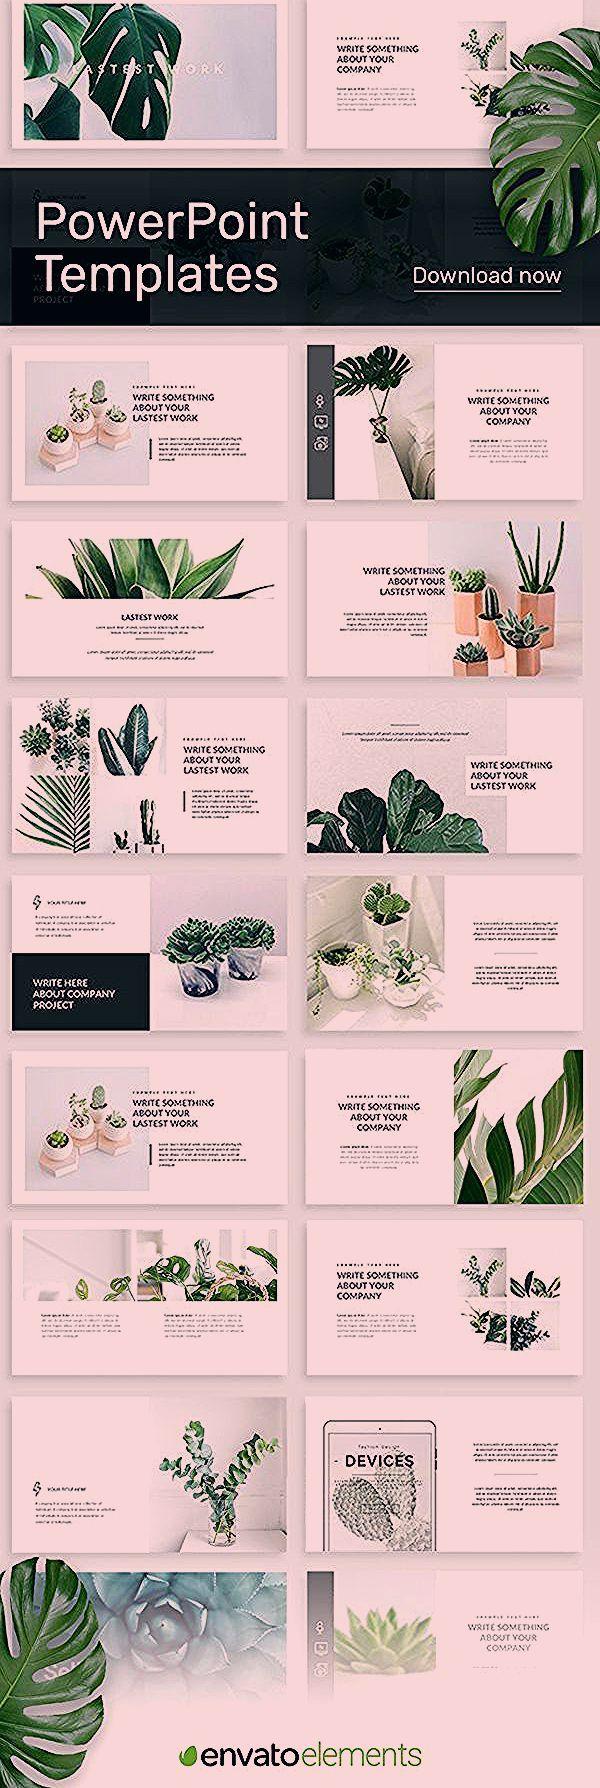 Elements  Best Website Design 2019  Best Freelance Web Designers  Creative Websites Templates  Best Website Design 2019 design